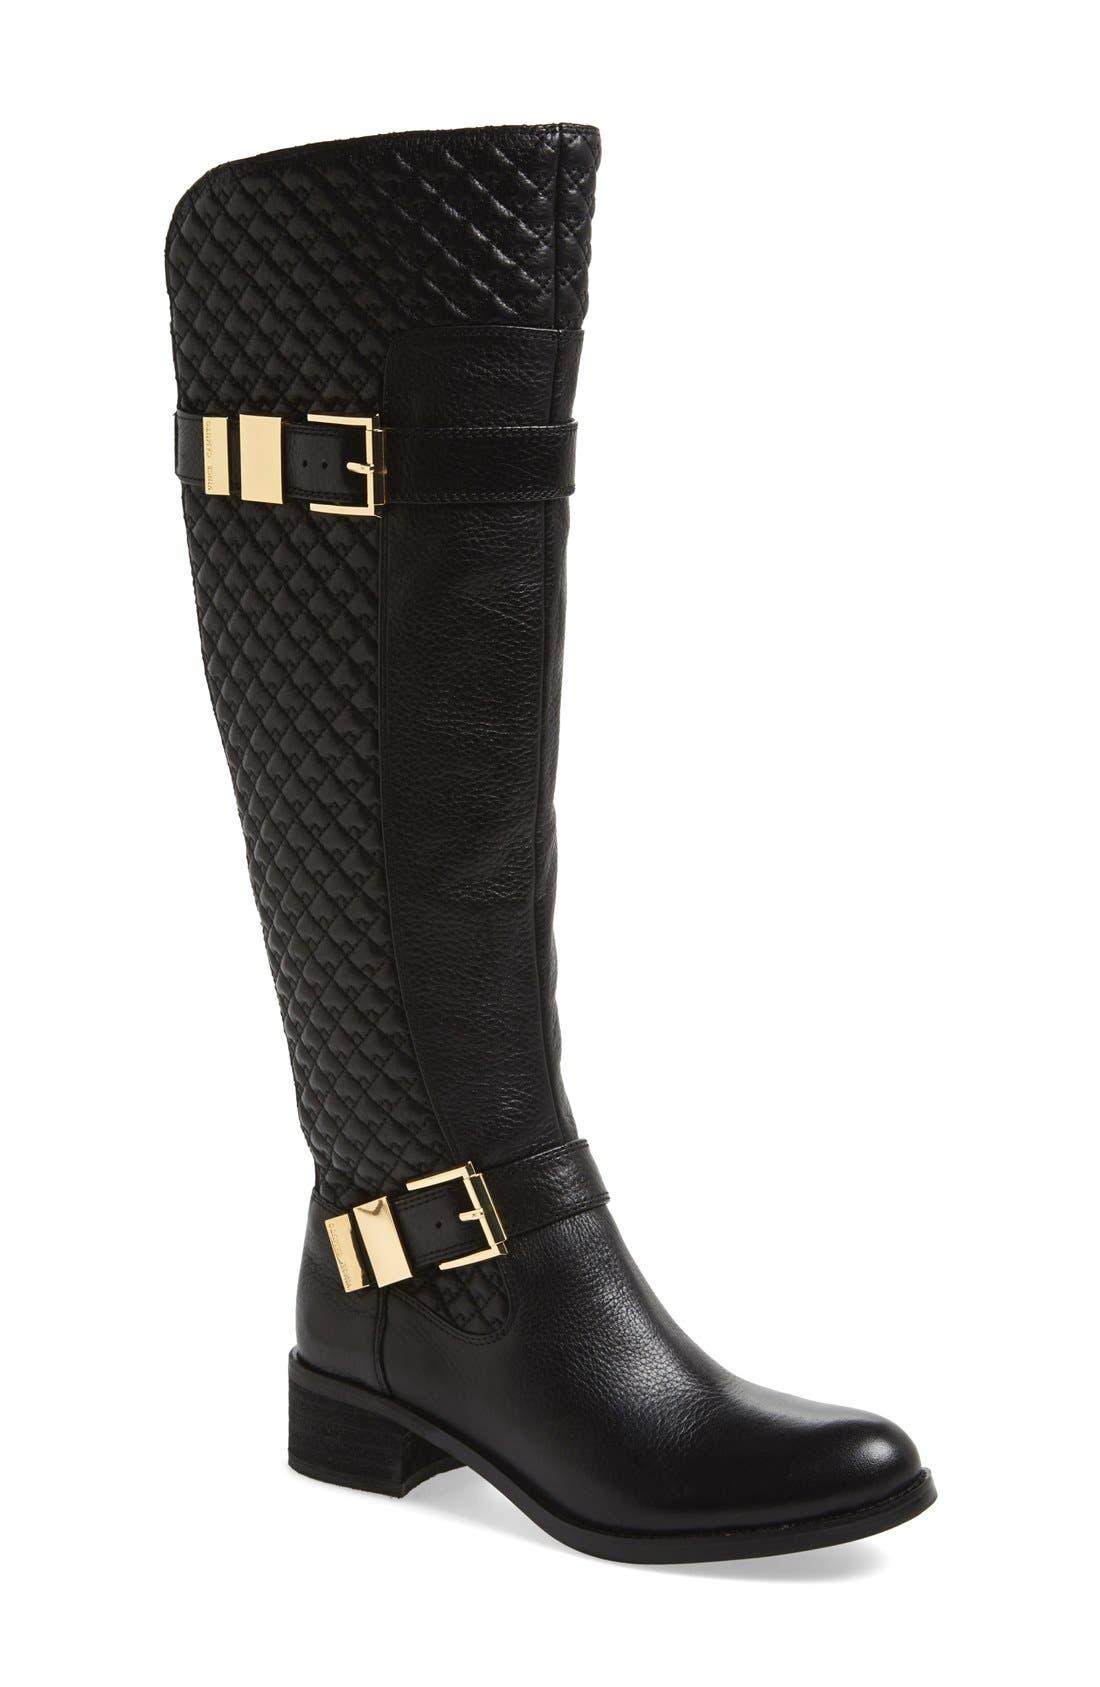 Main Image - Vince Camuto 'Faris' Tall Boot (Women)